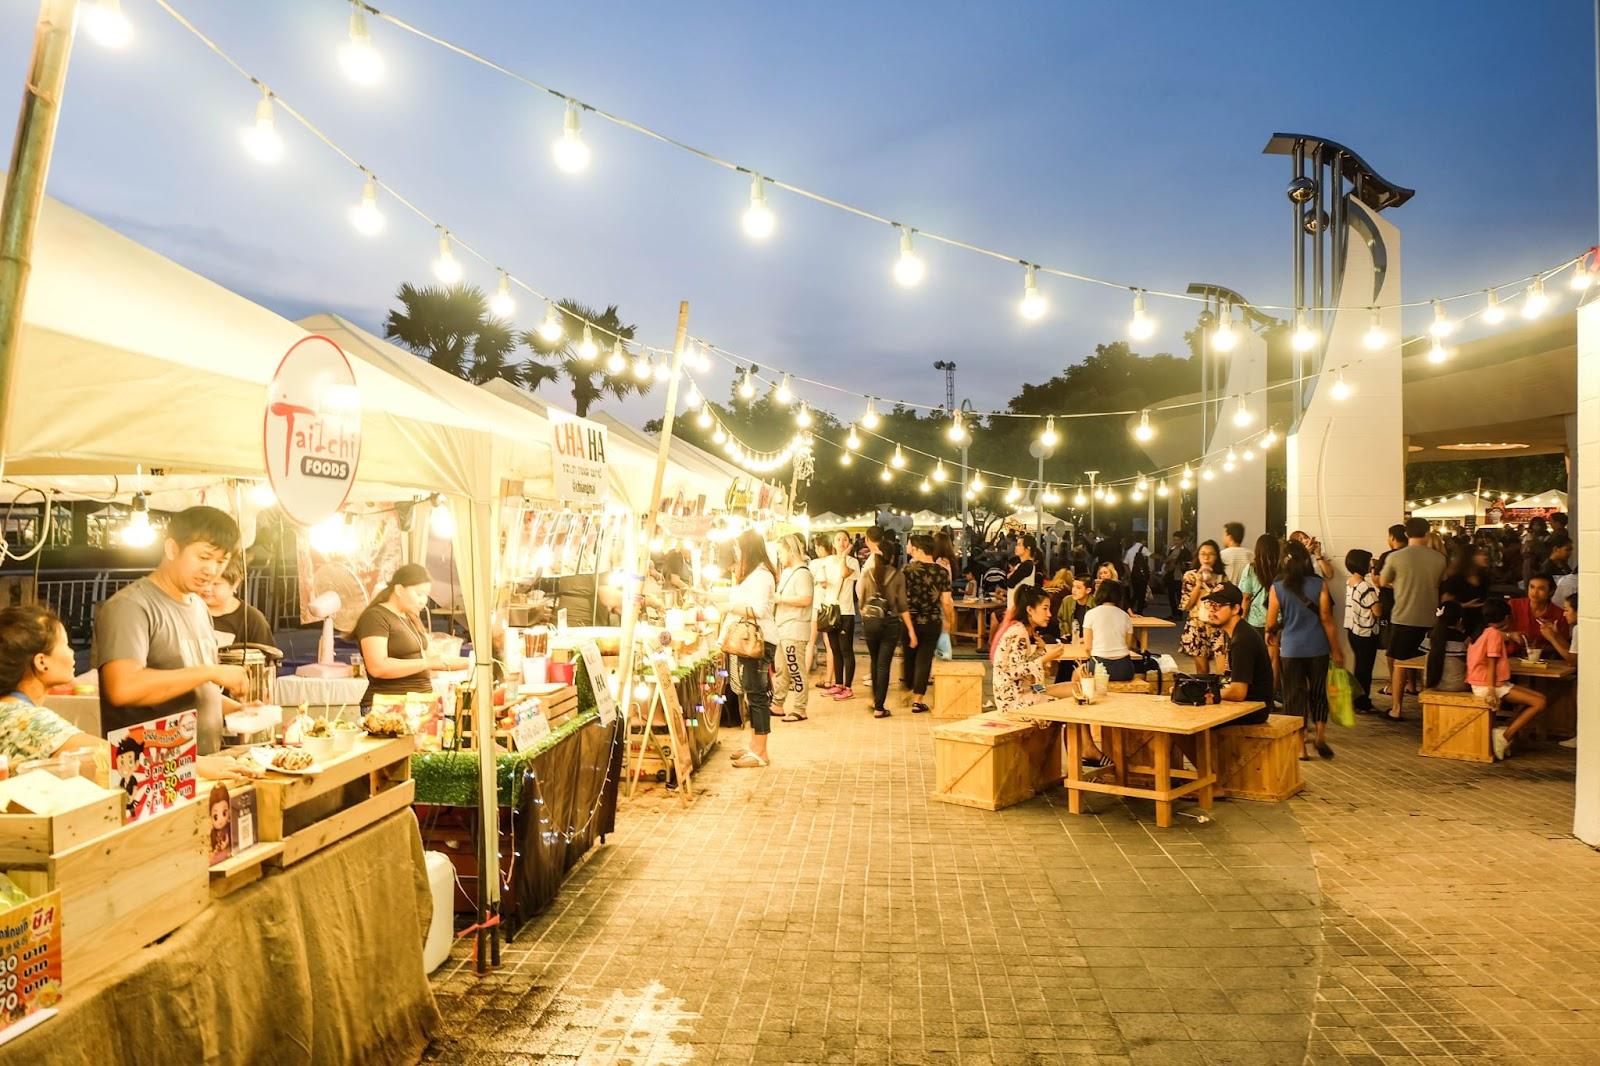 Bangkok street food vendors allow tourists to experience local cuisine